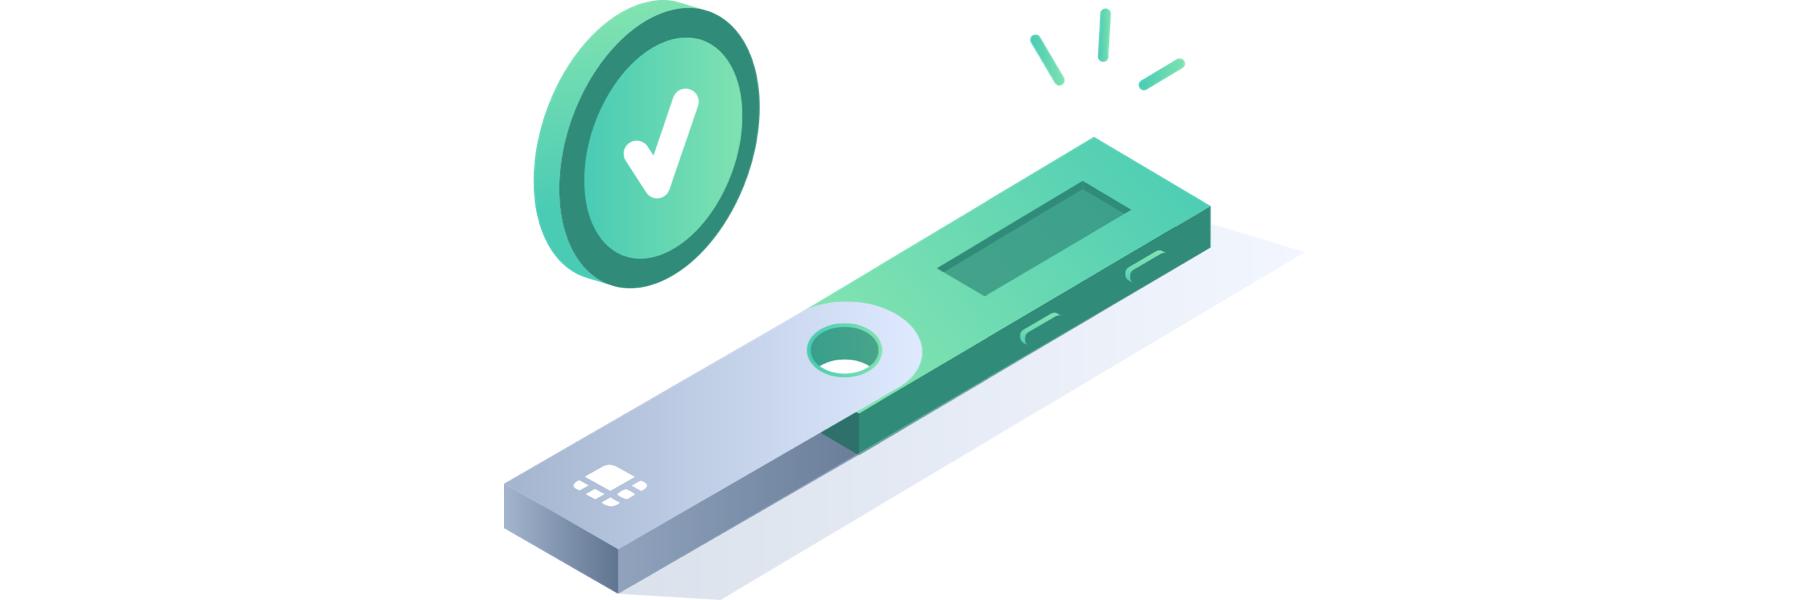 Increase crypto security